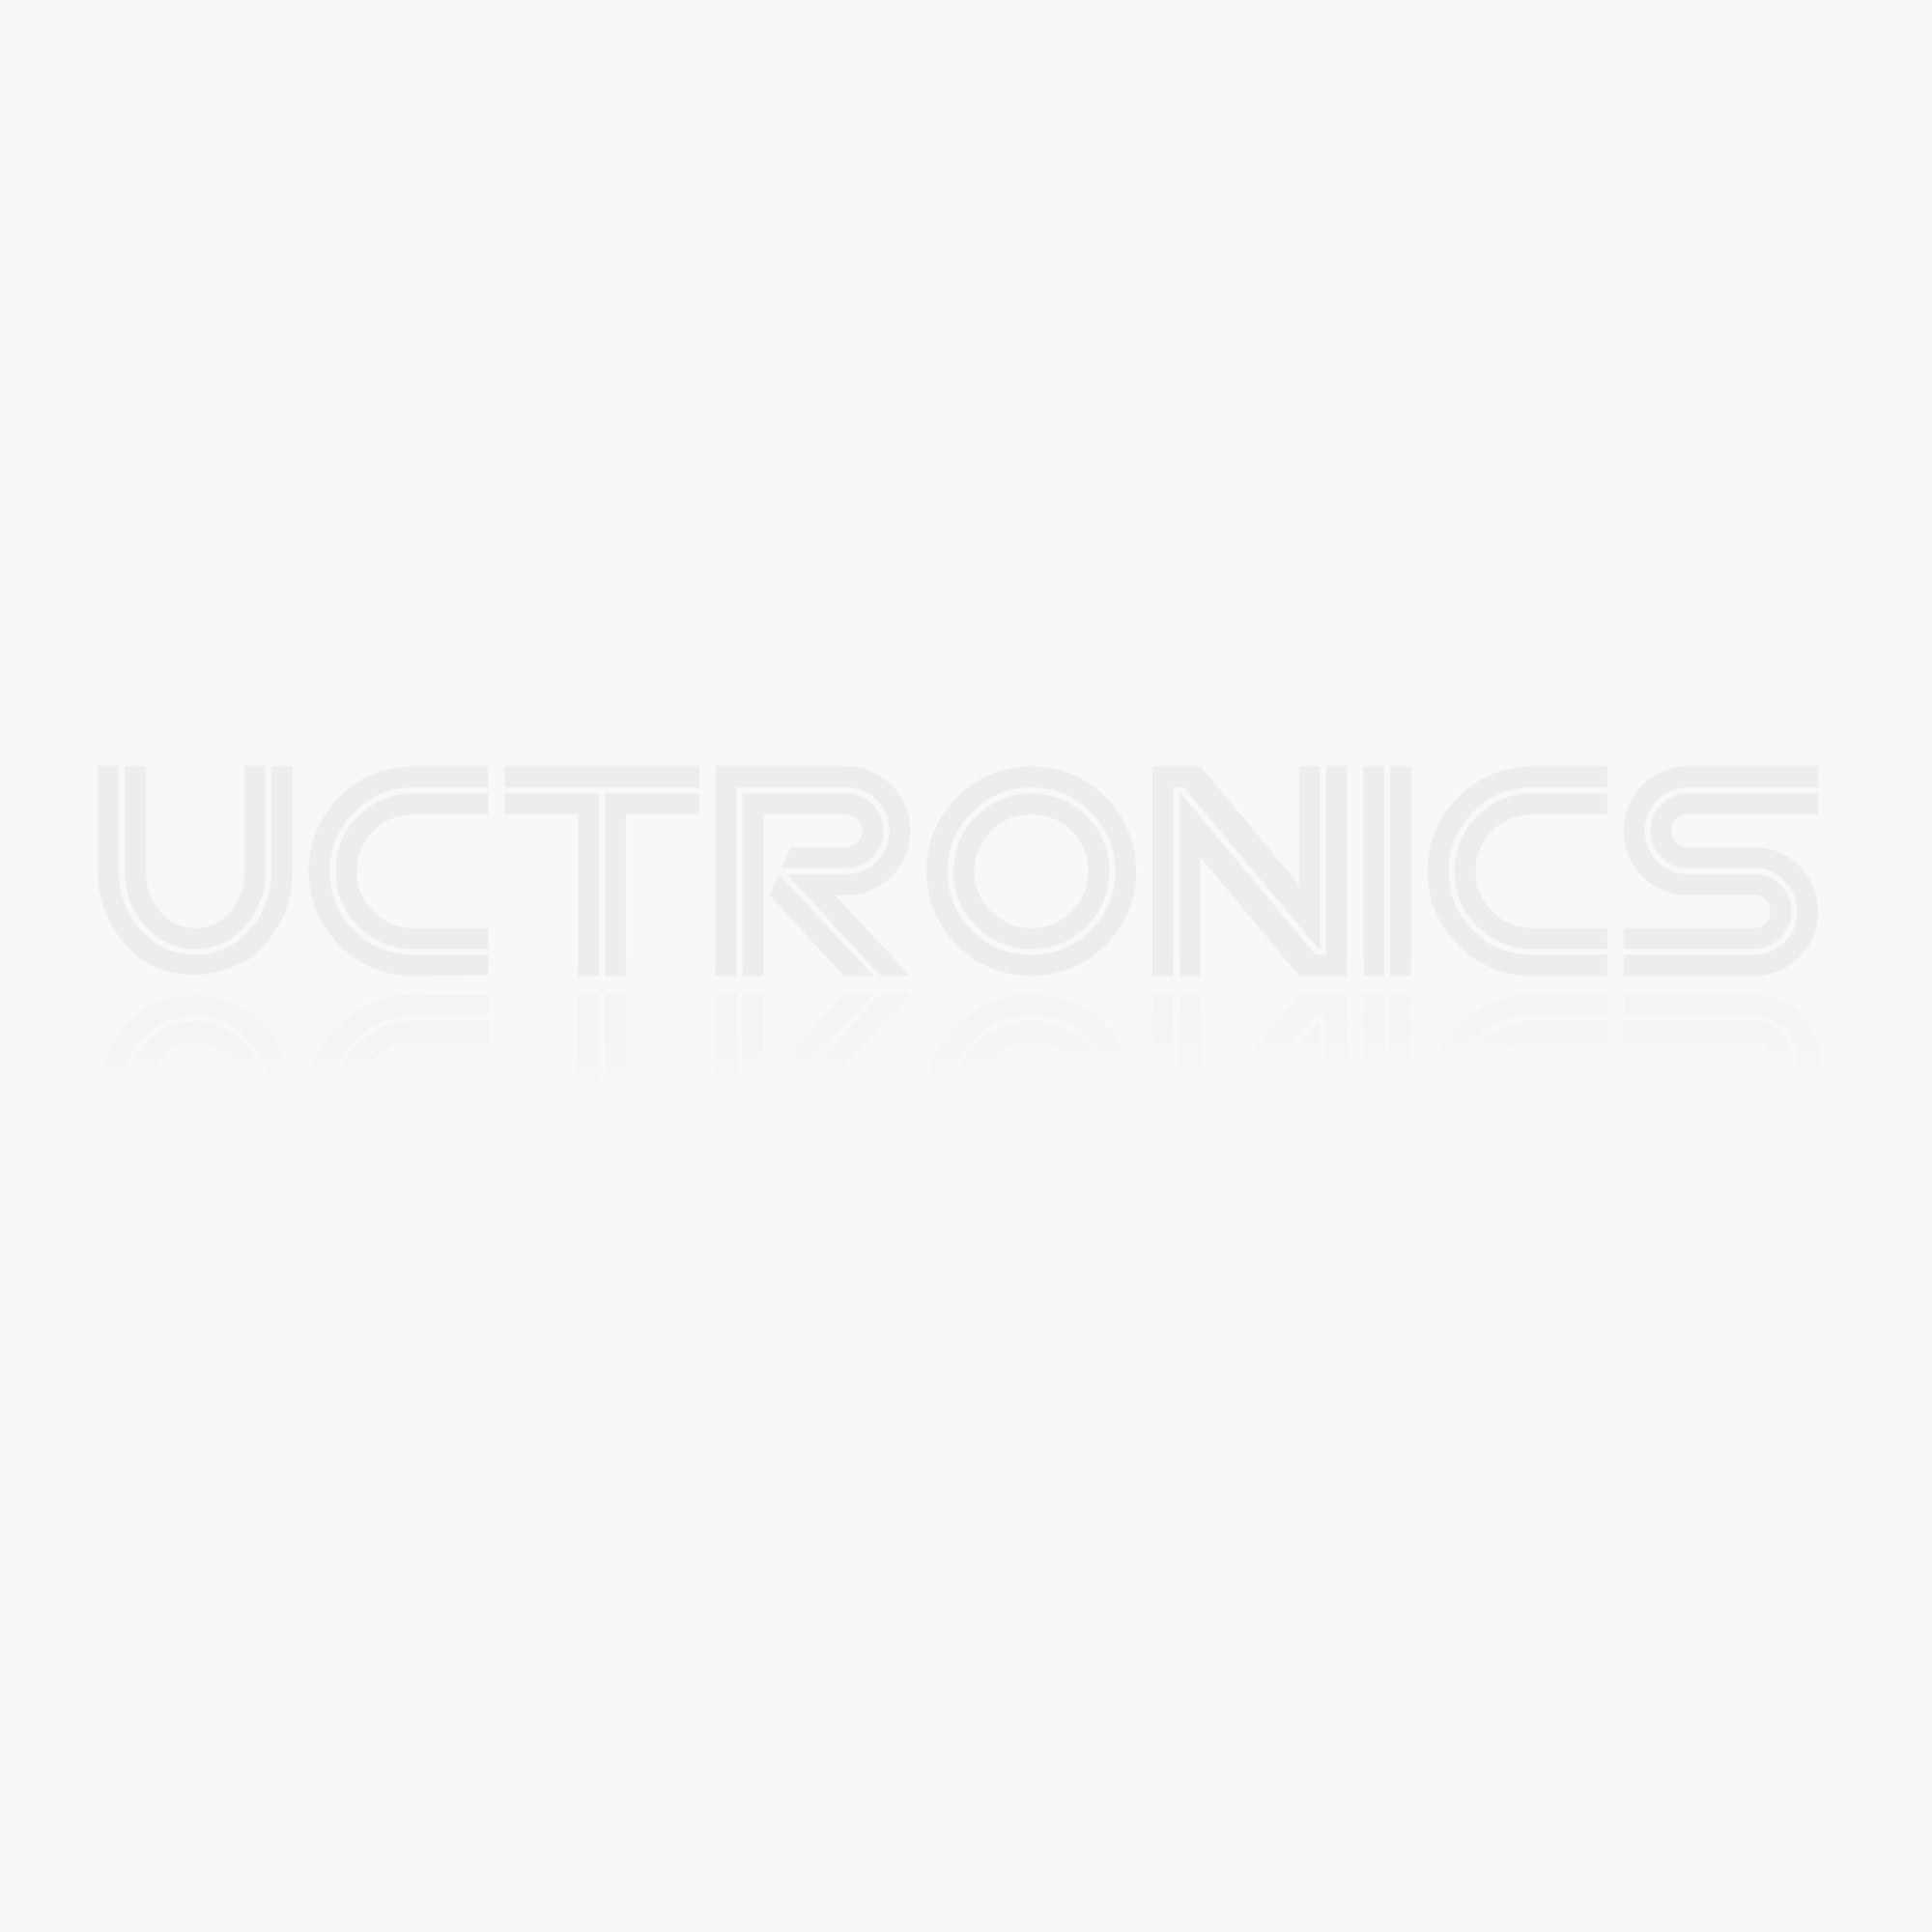 US-015 Ultrasonic Distance Measuring Sensor Module for Arduino